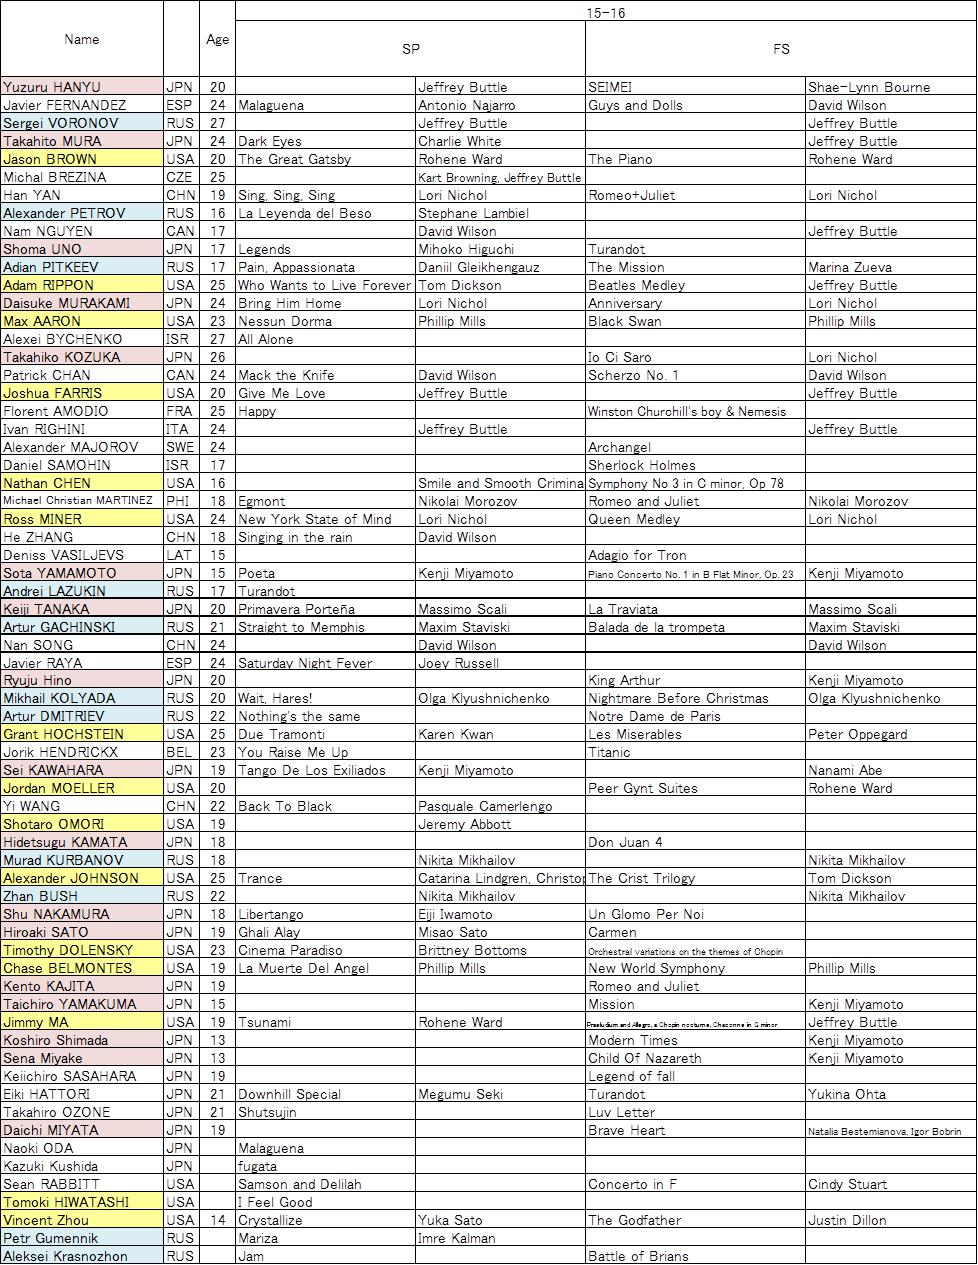 Новости сезона 2015-2016 - Страница 20 15-16ProgramsM_20150724213244018